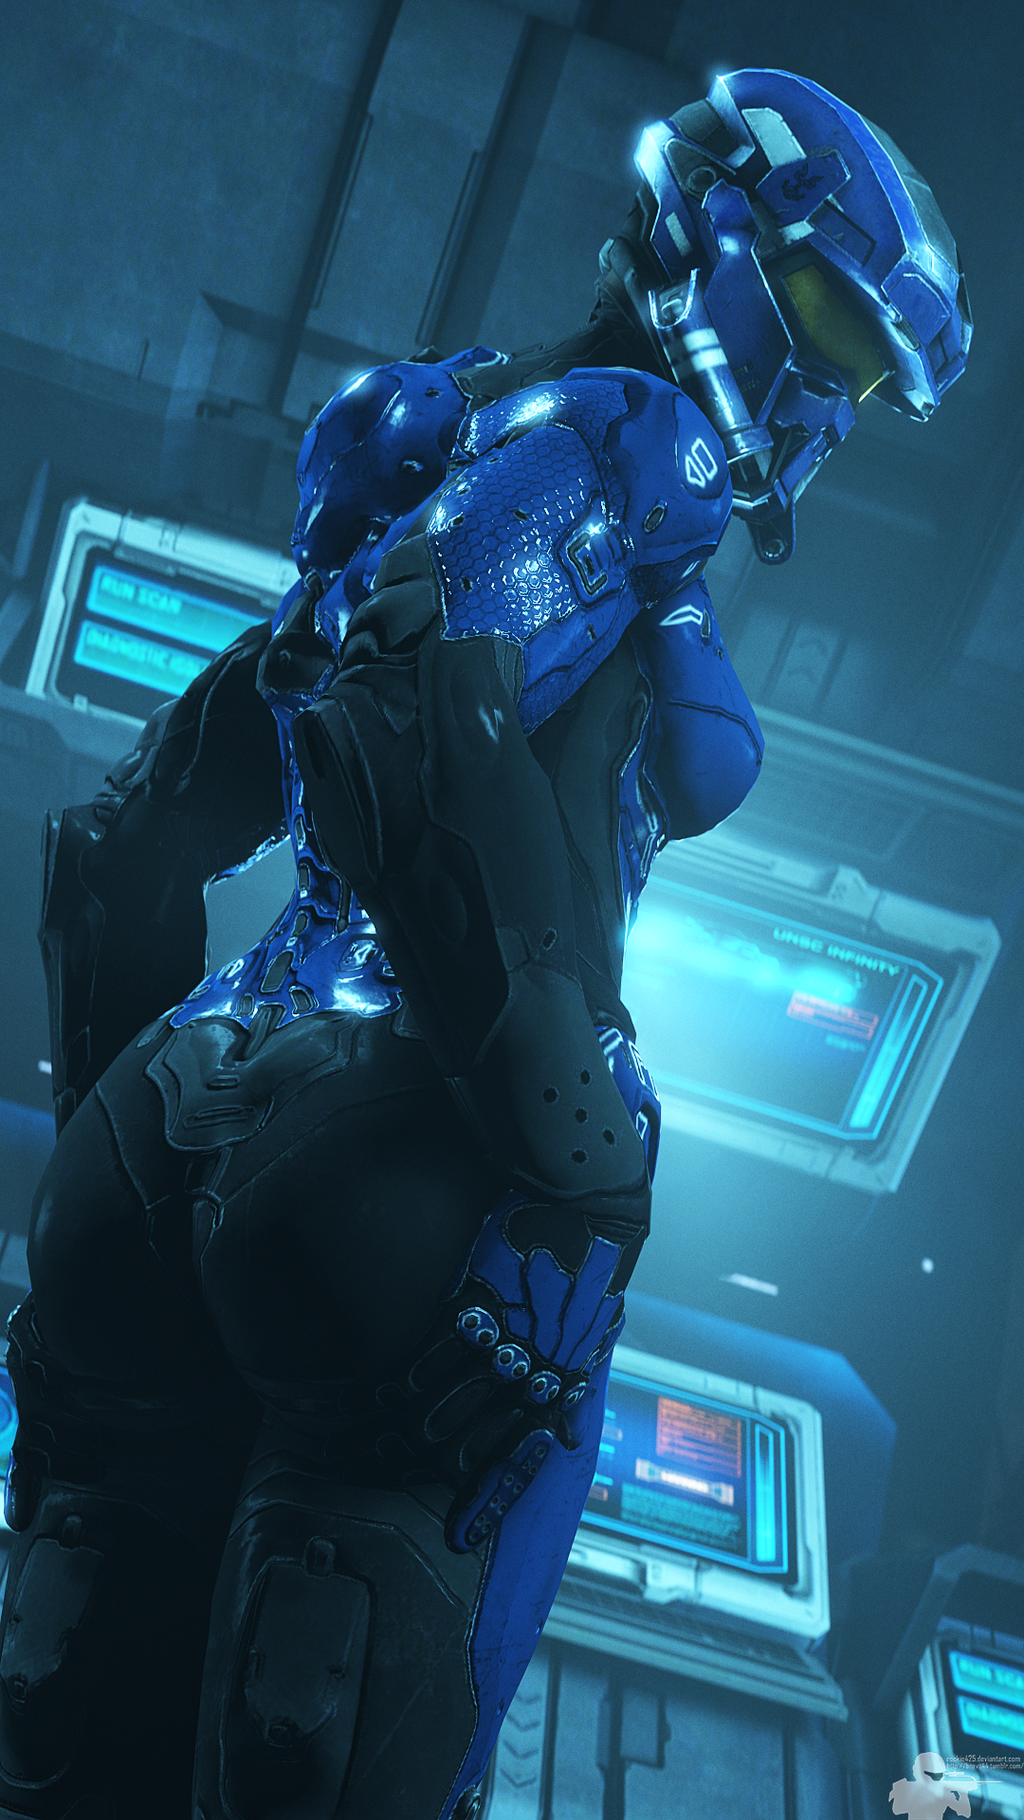 Halo 5 cortana porno sexy photo